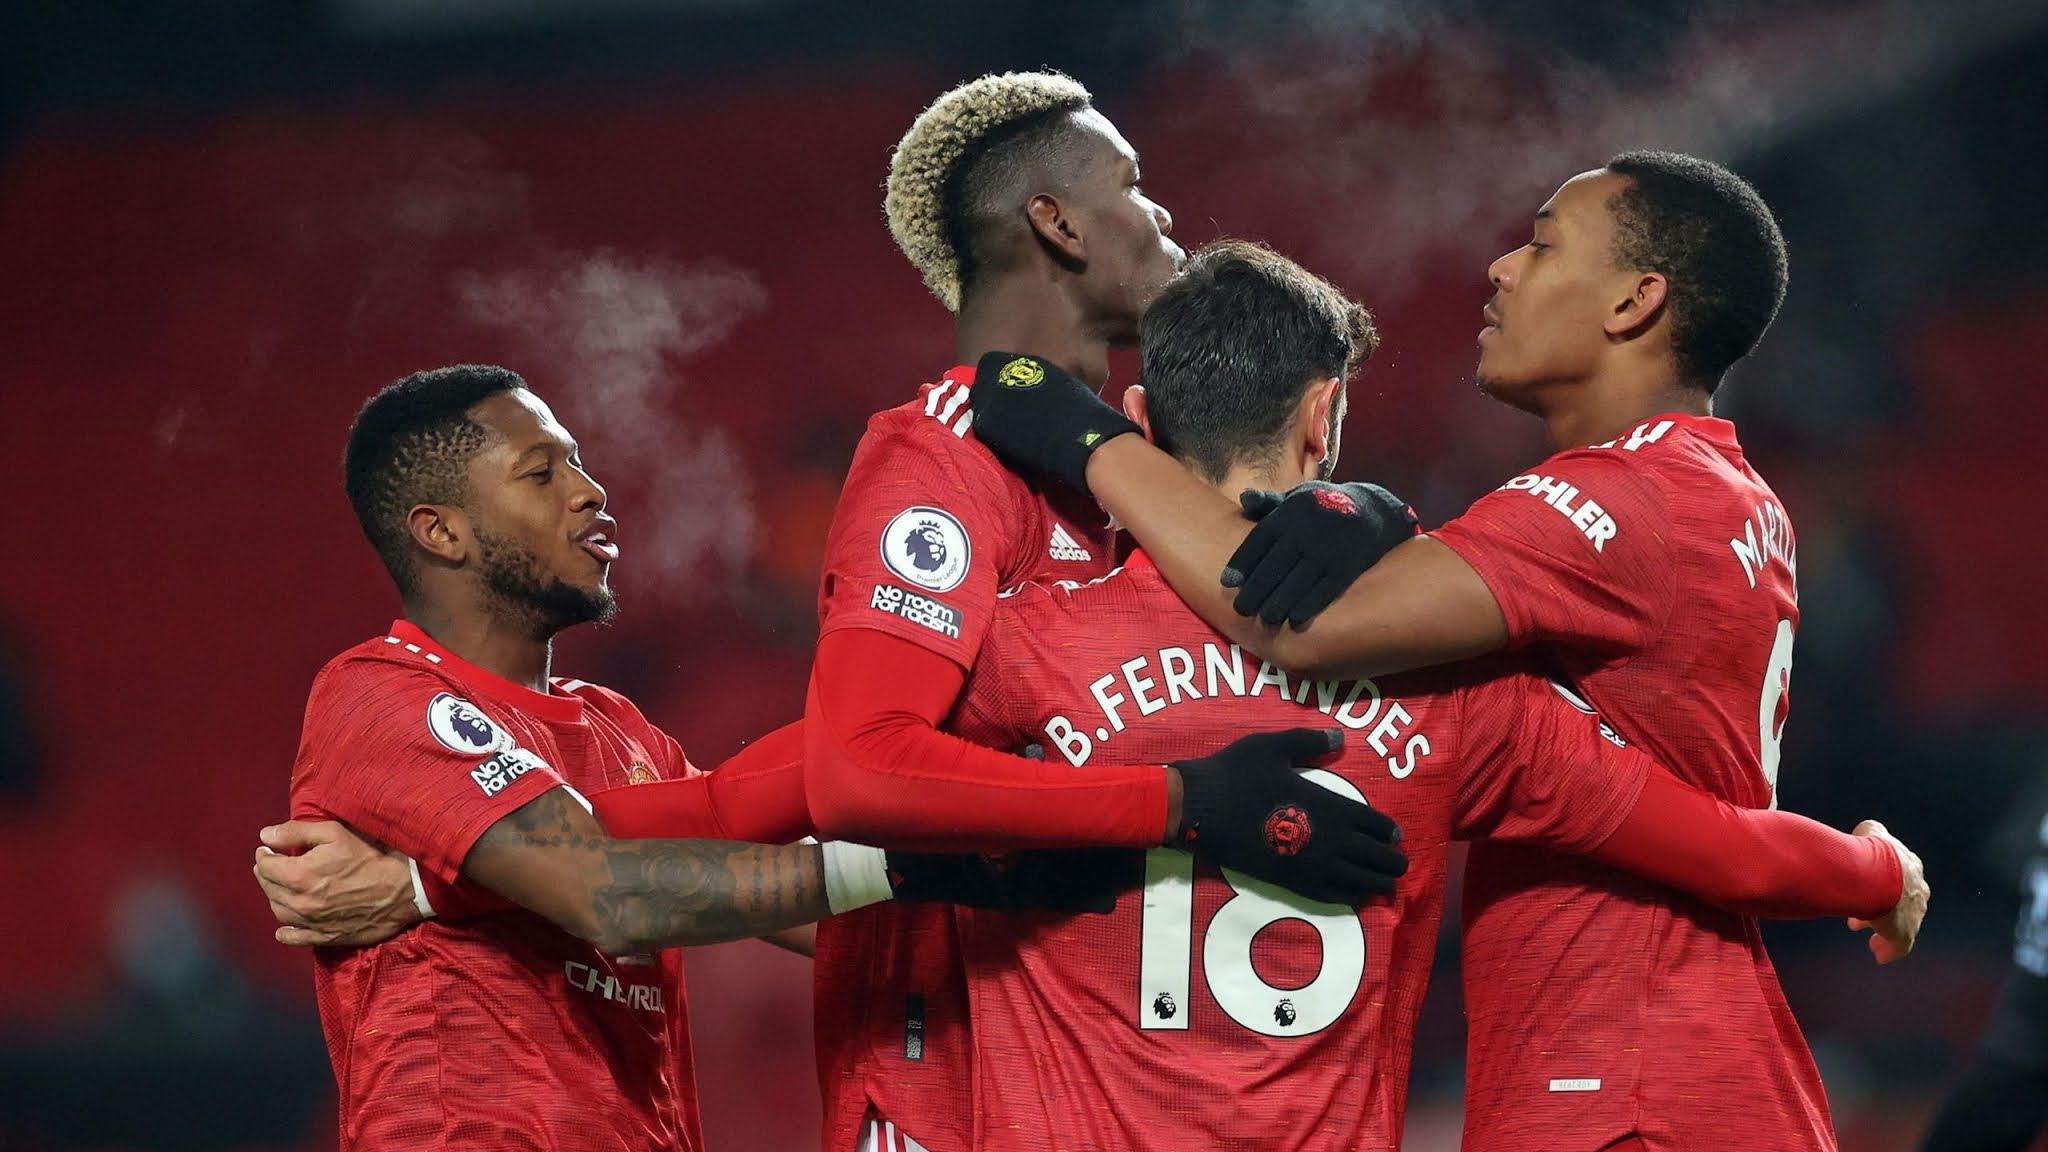 Manchester United 9-0 Southampton: Manchester United Thrash Nine-Man Saints